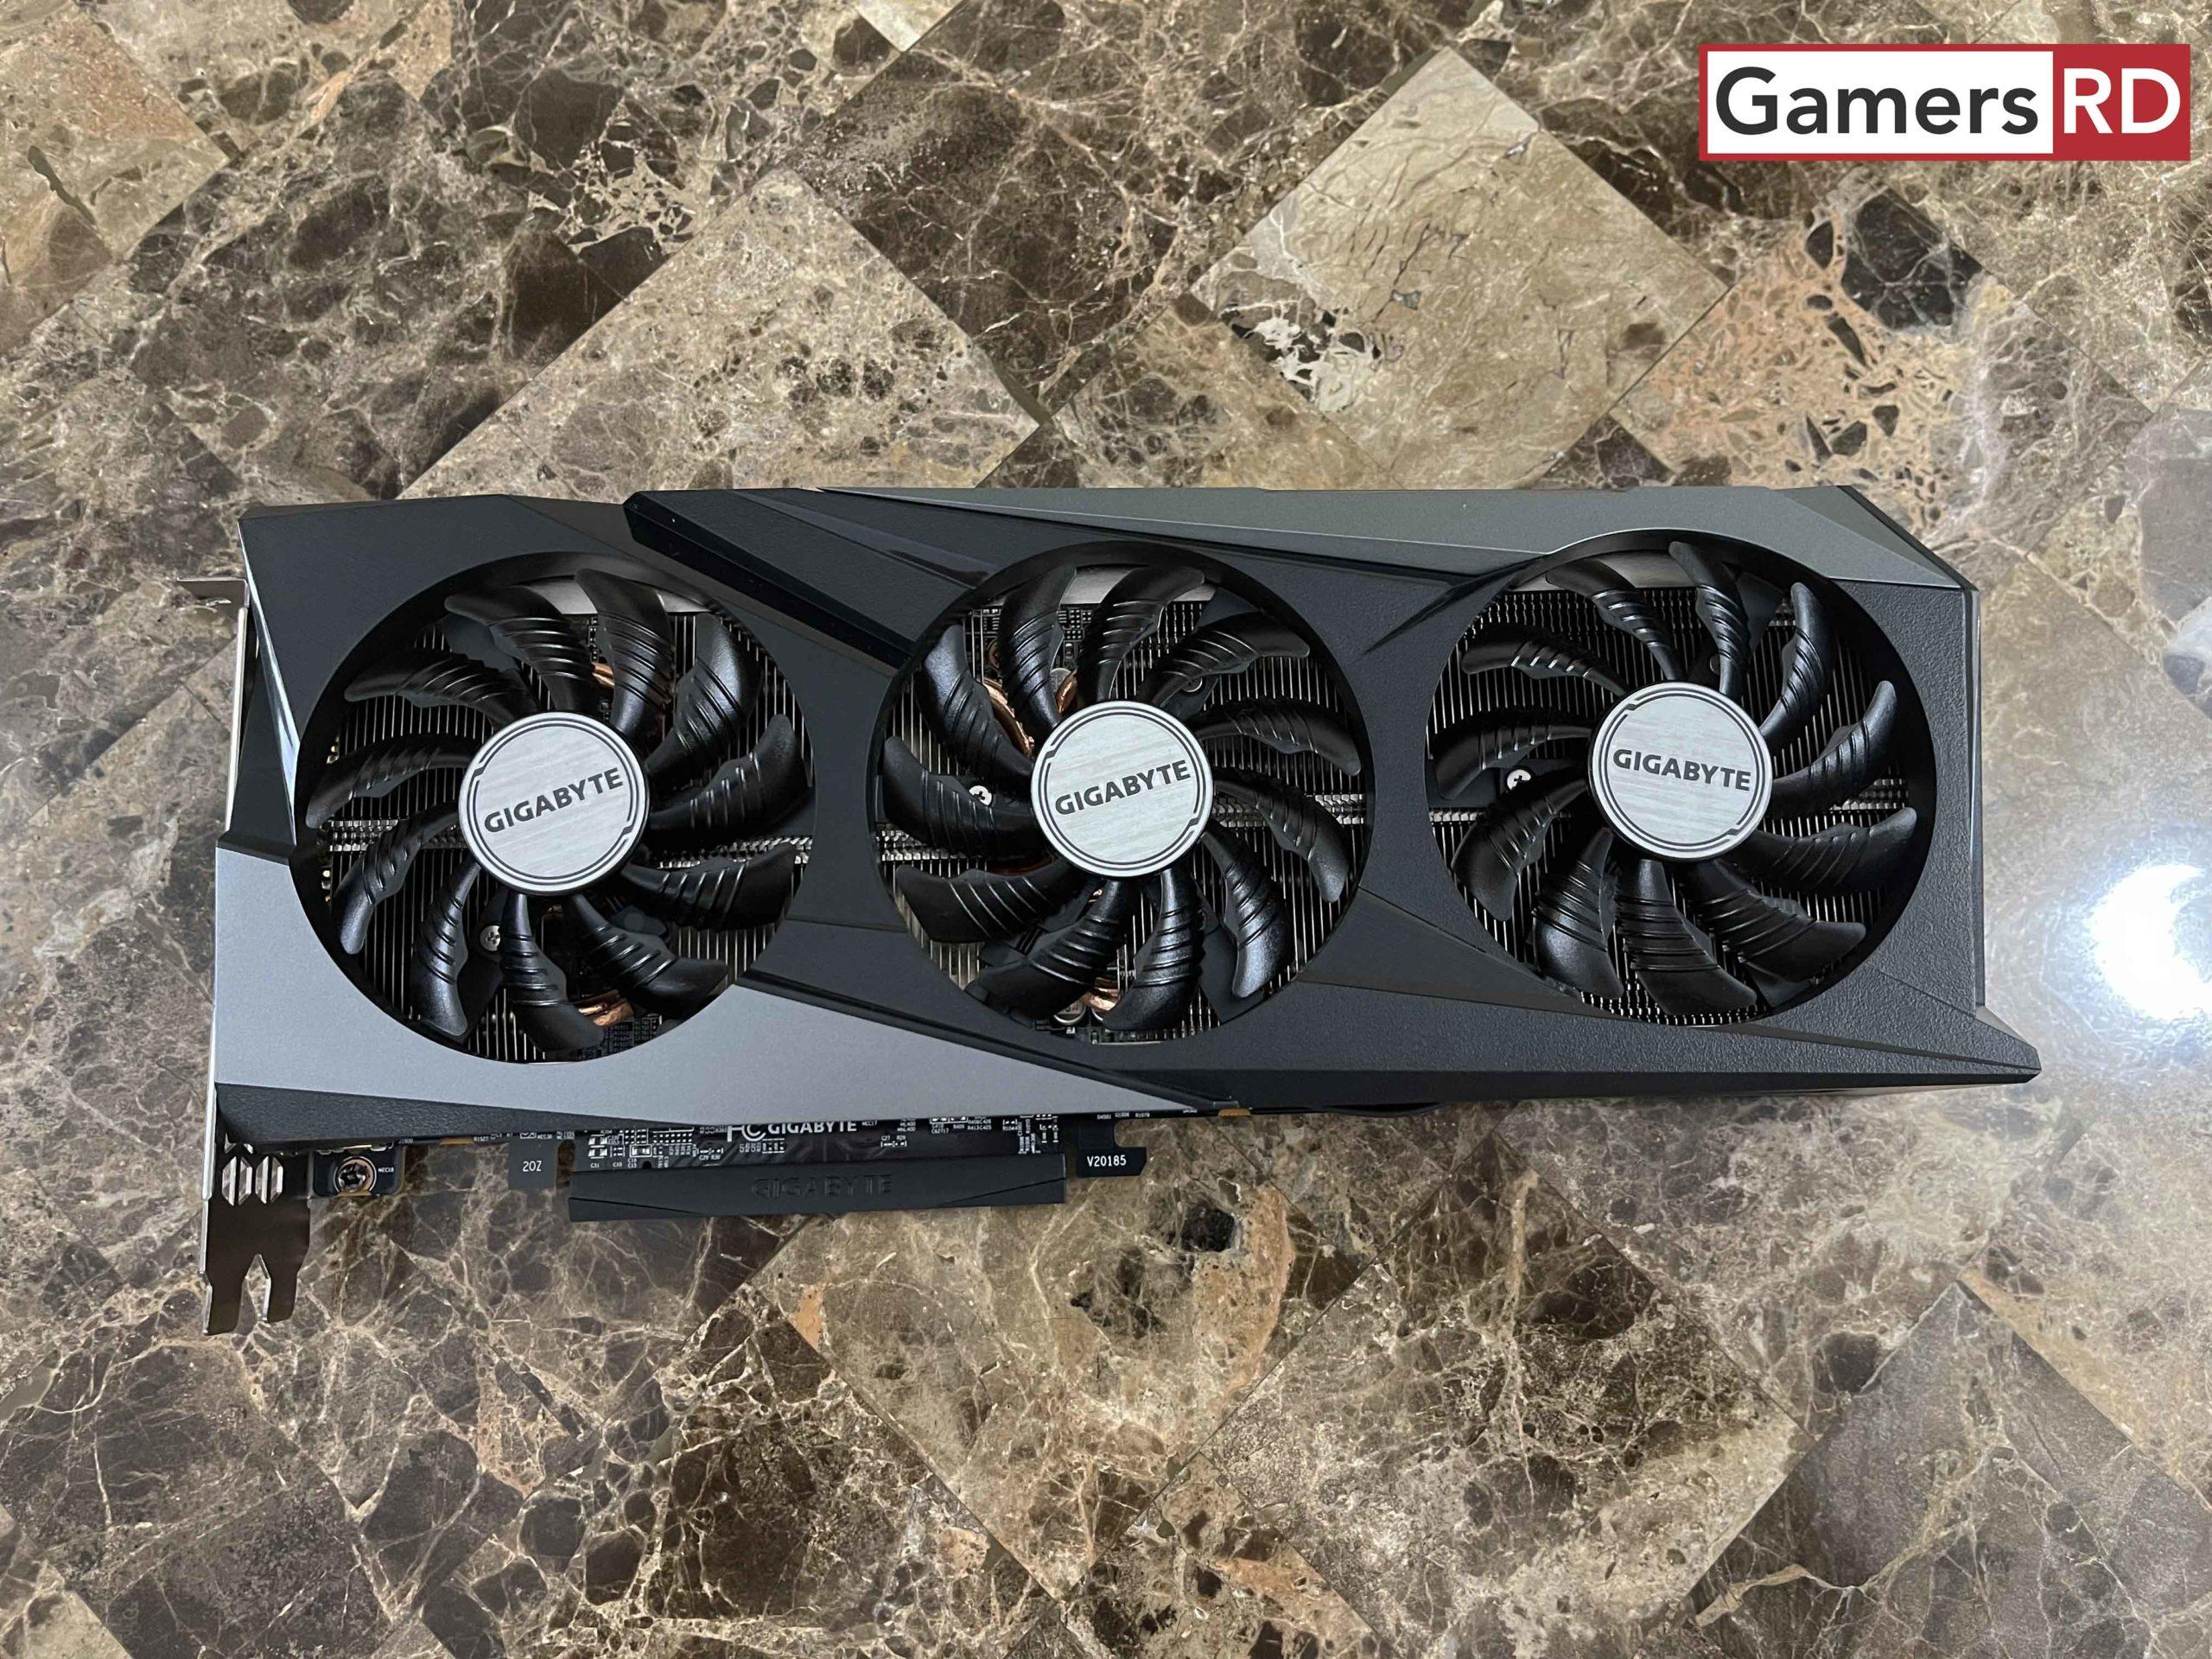 AMD Radeon RX 6600 XT GIGABYTE OC REVIEW 8 GAMERSRD